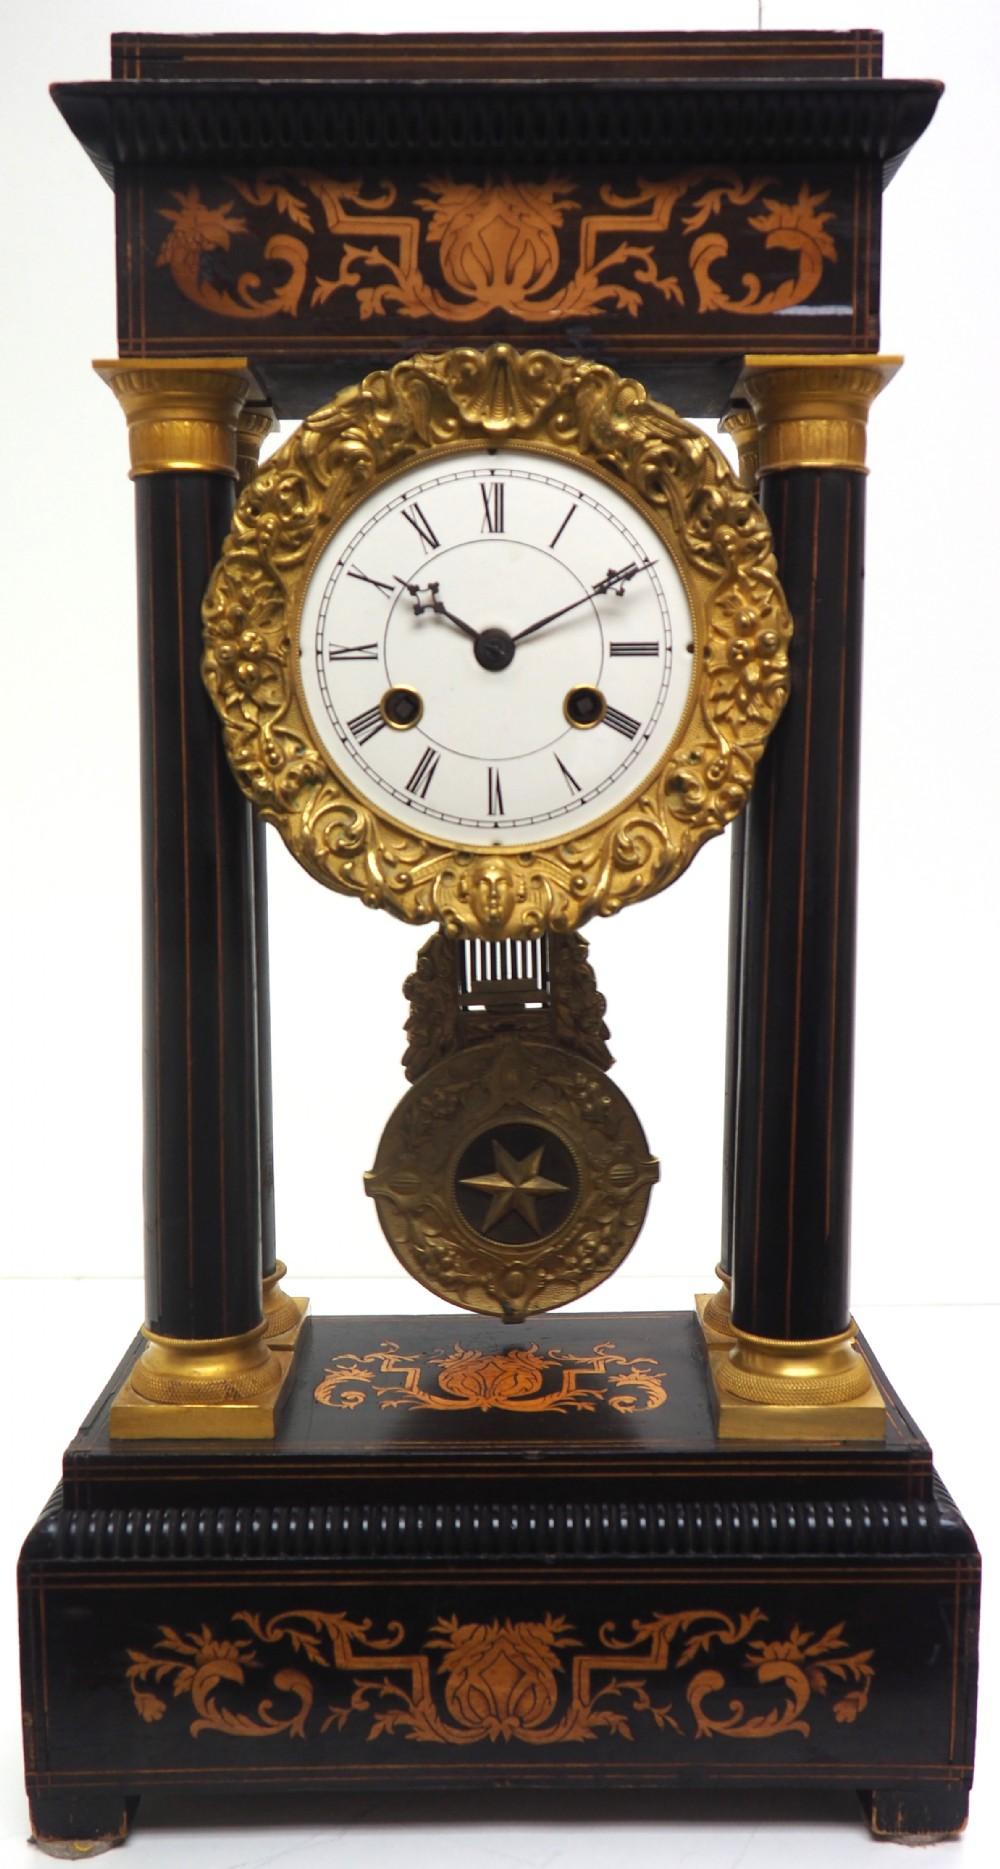 antique satinwood inlaid mantel clock rosewood french striking portico mantle clock